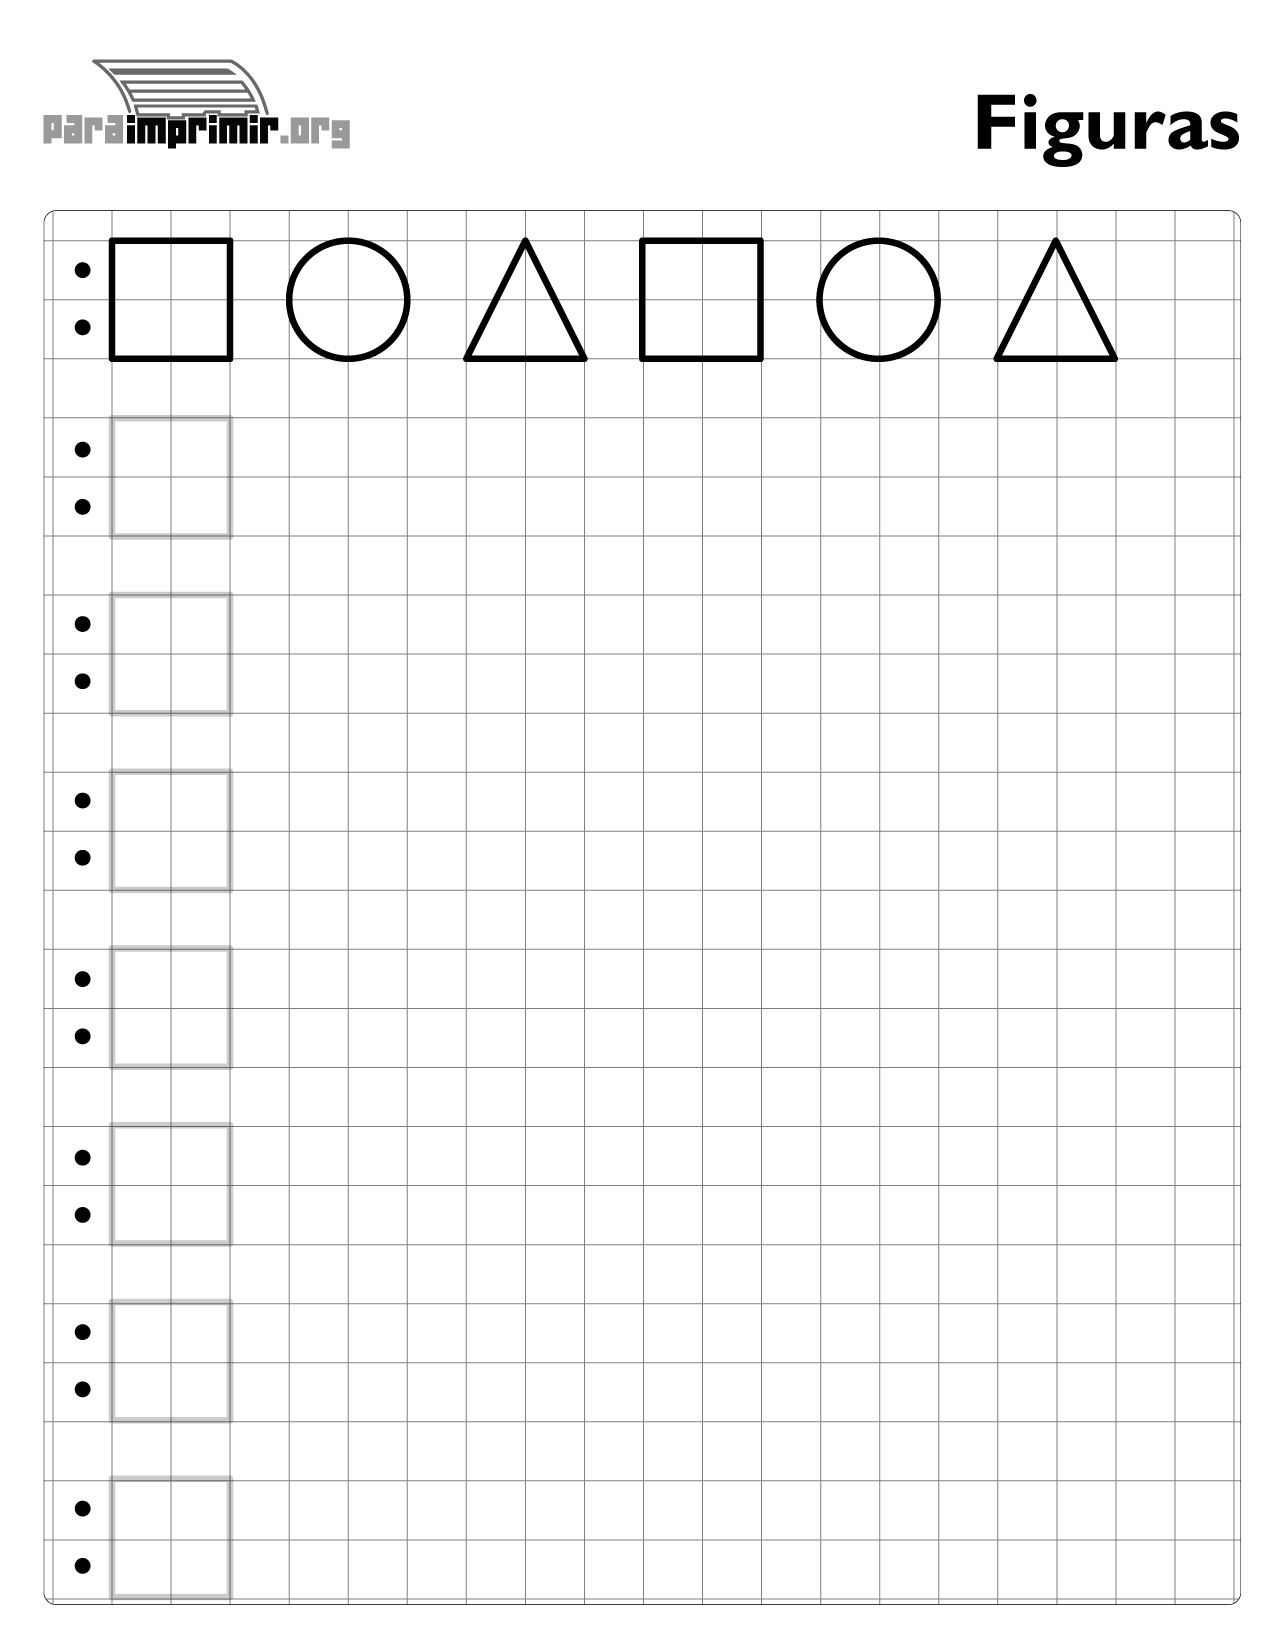 Figuras Geométricas Para Aprender Y Para Imprimir